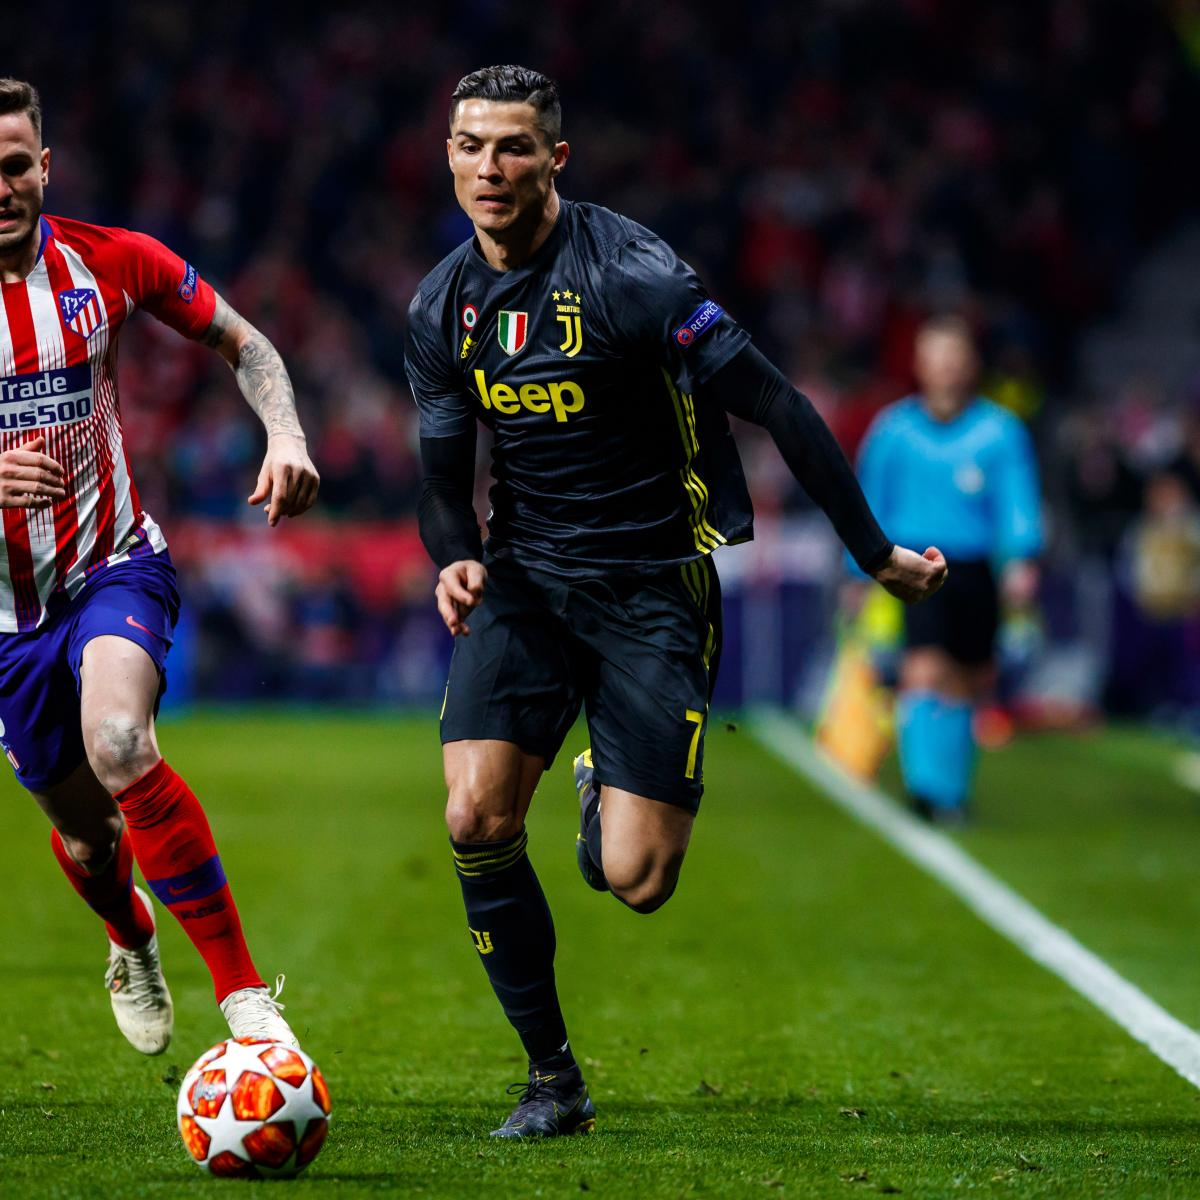 Champions League 2019 Round Of 16 Leg 2 Live Stream Tv: Champions League 2019: Tuesday Odds, Live Stream For Round